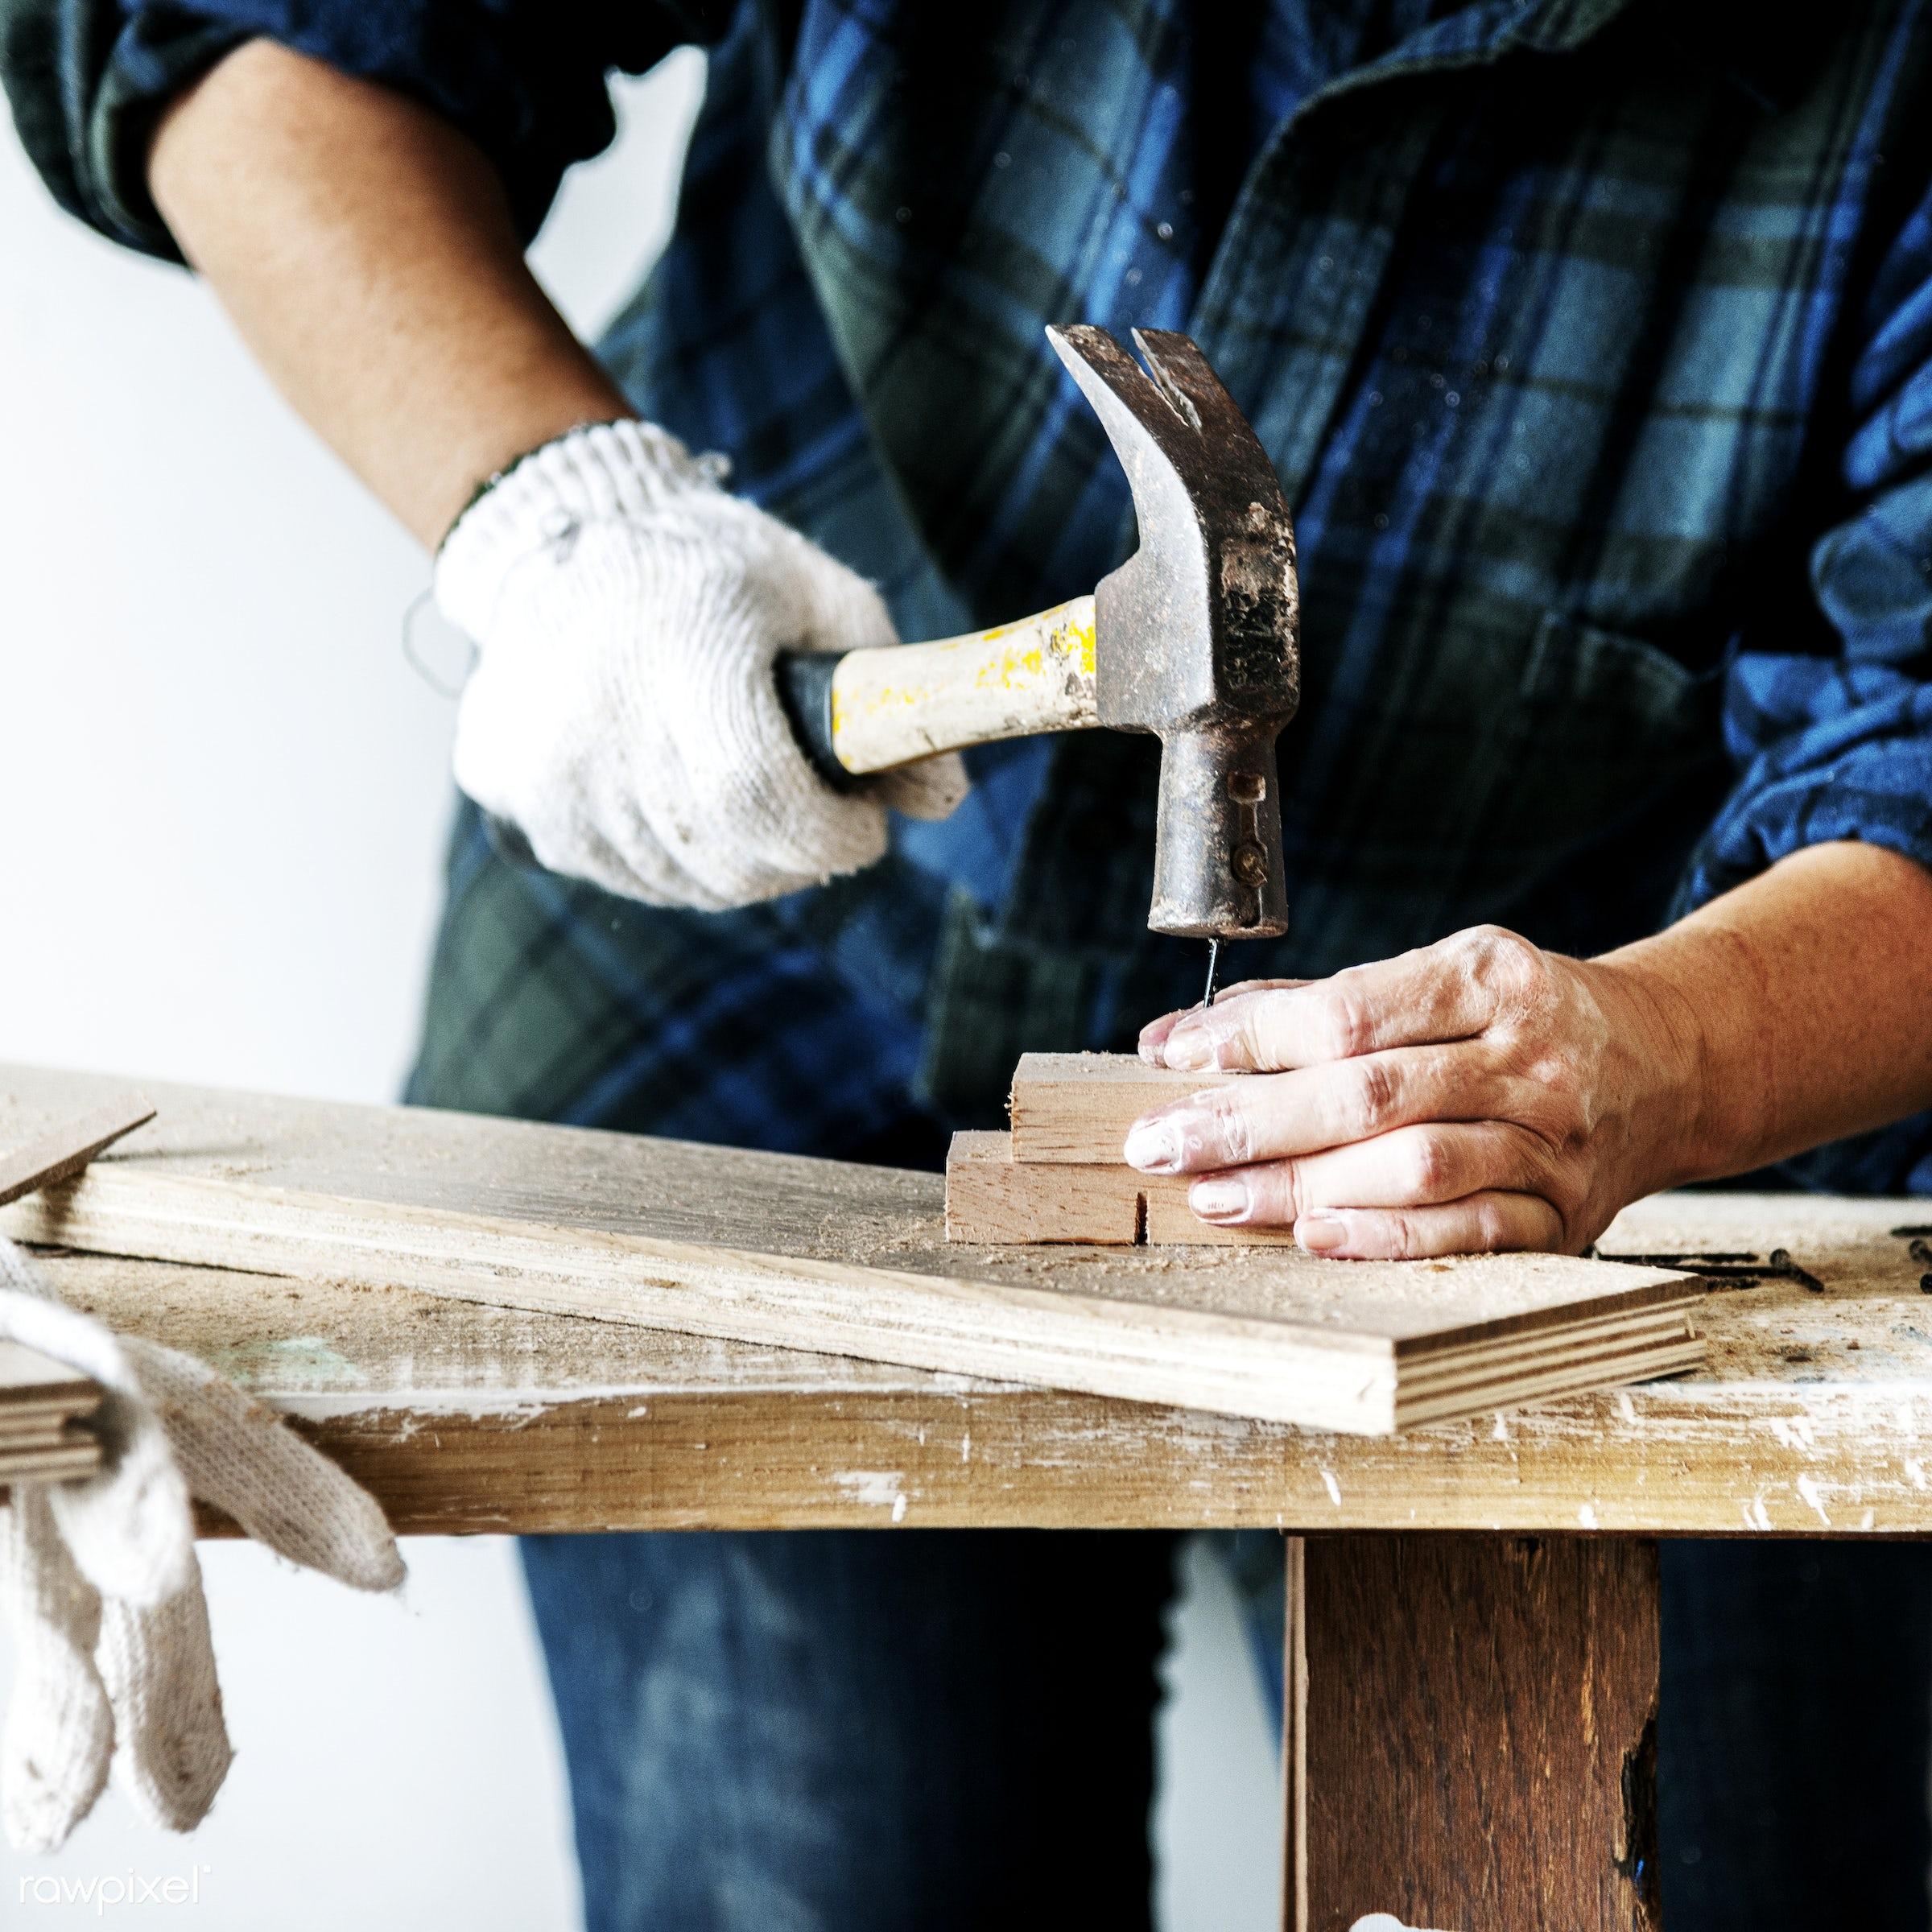 craft, wood, carpentry, tool, plank, equipment, hammer, diy, carpenter, woman, craftsman, handyman, worker, repair, industry...